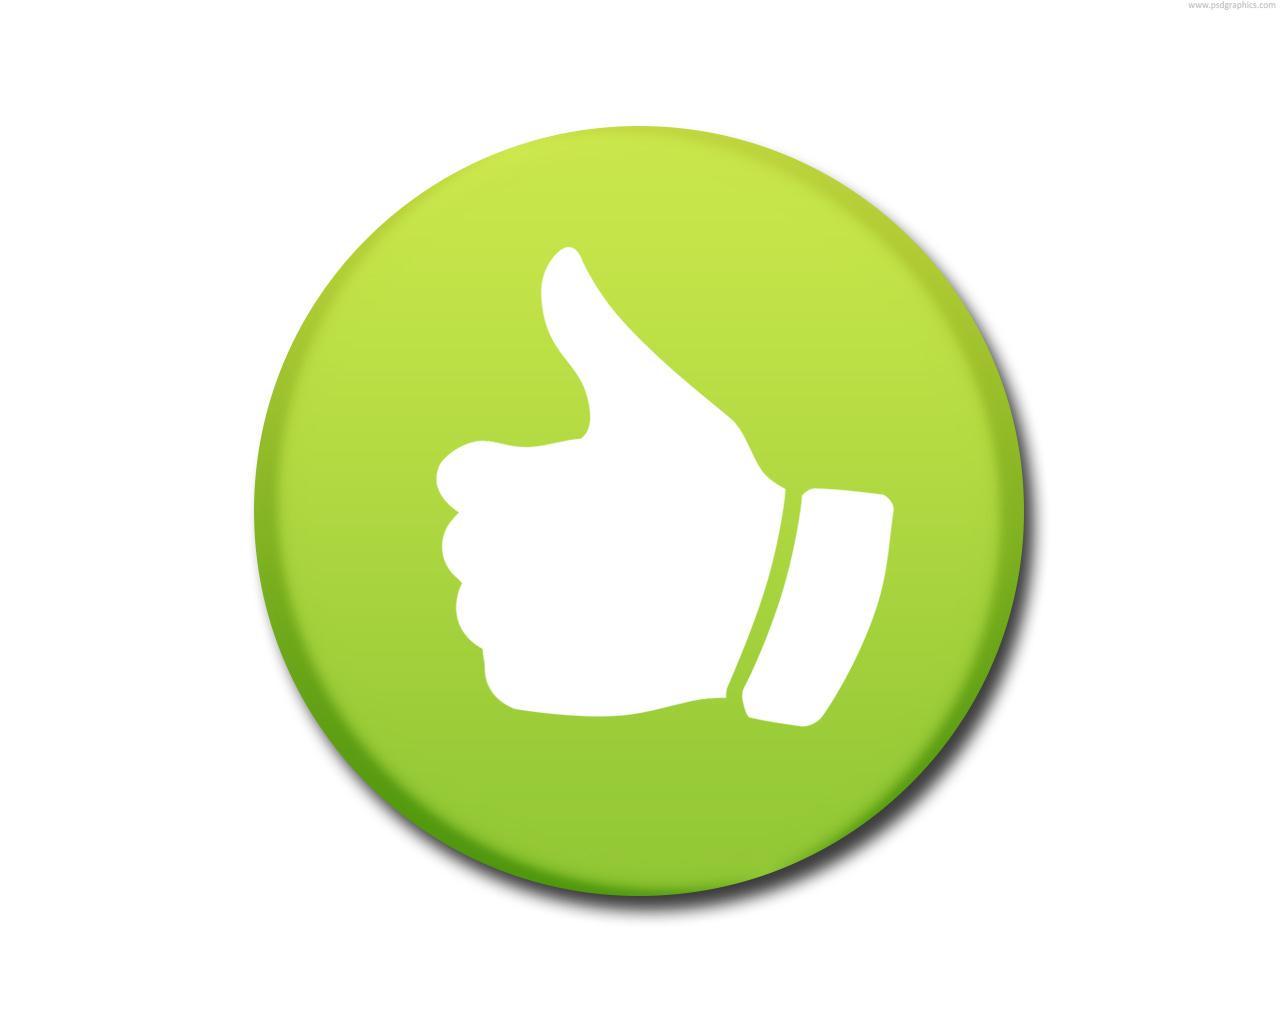 1280x1024 Thumbs Up